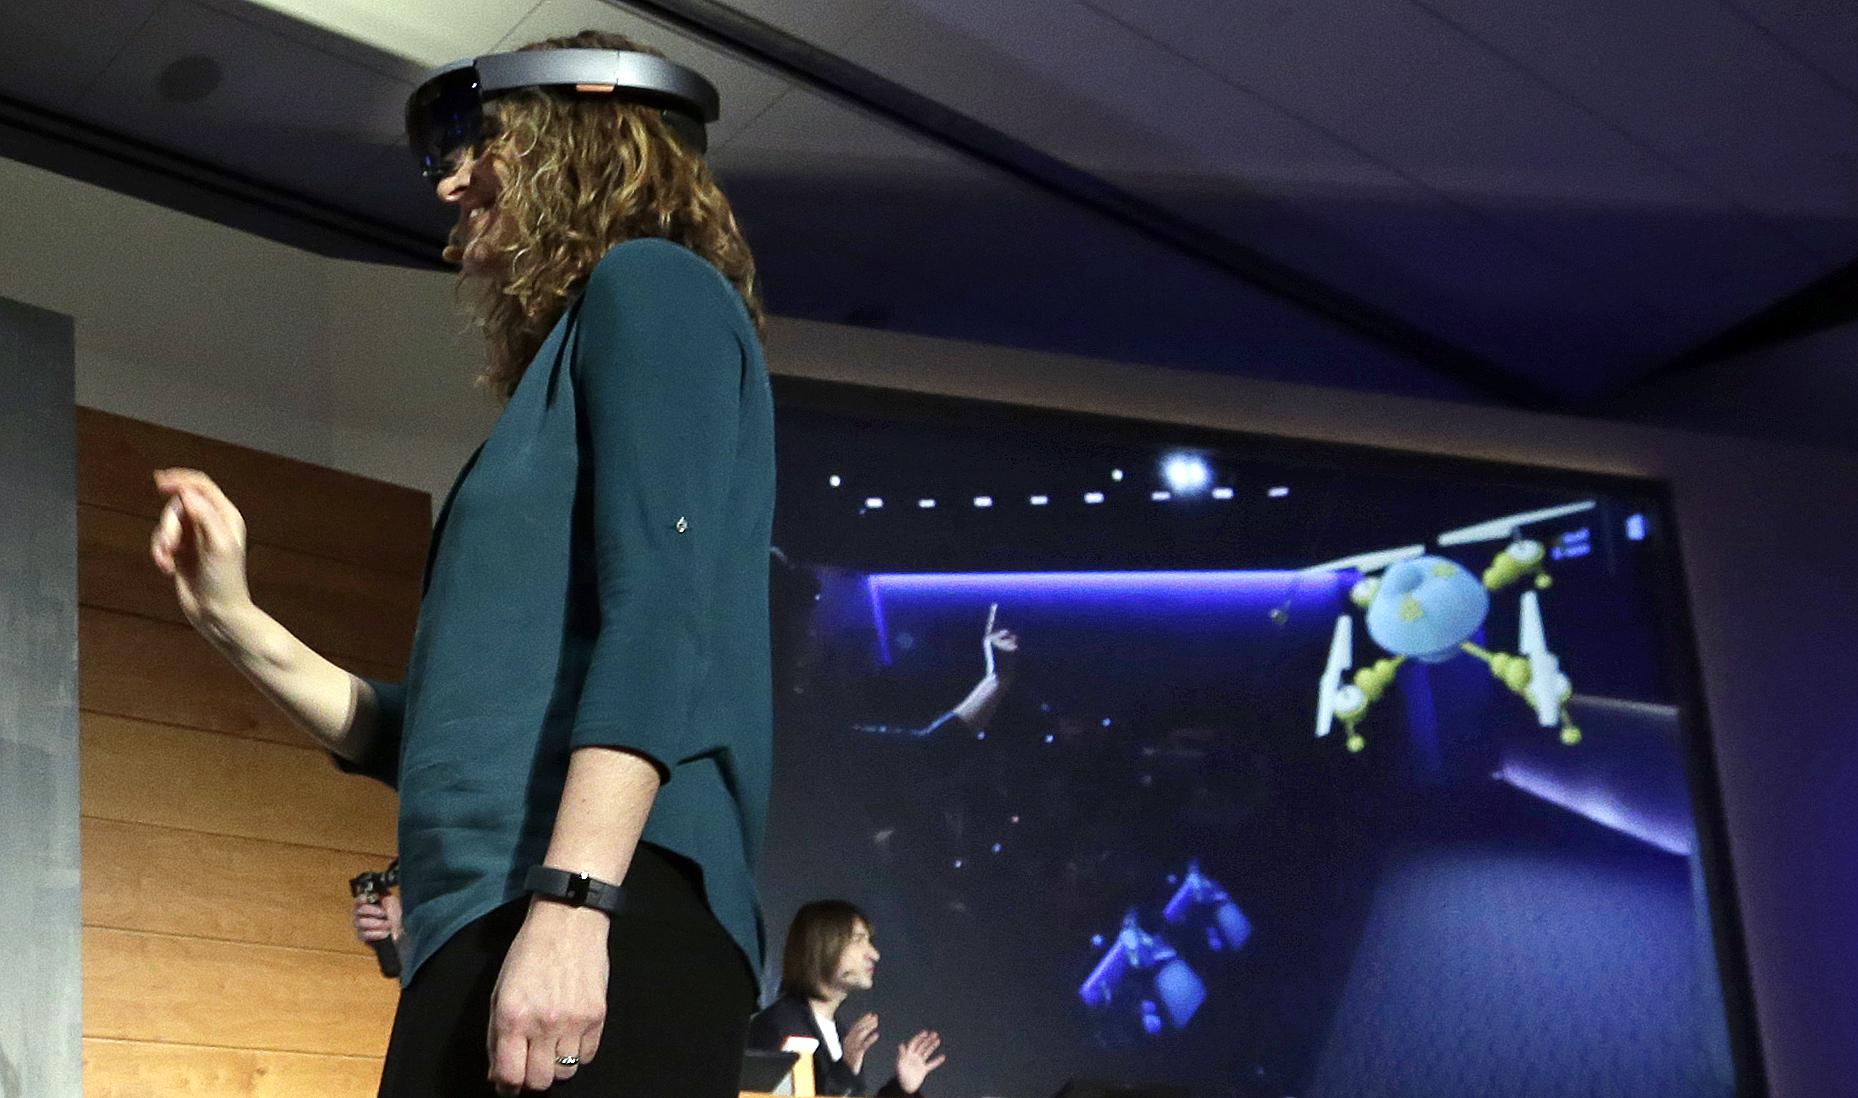 Microsoft's Lorraine Bardeen demonstrates the new Microsoft HoloLens headset in Redmond, Wash. on Jan. 21, 2015.